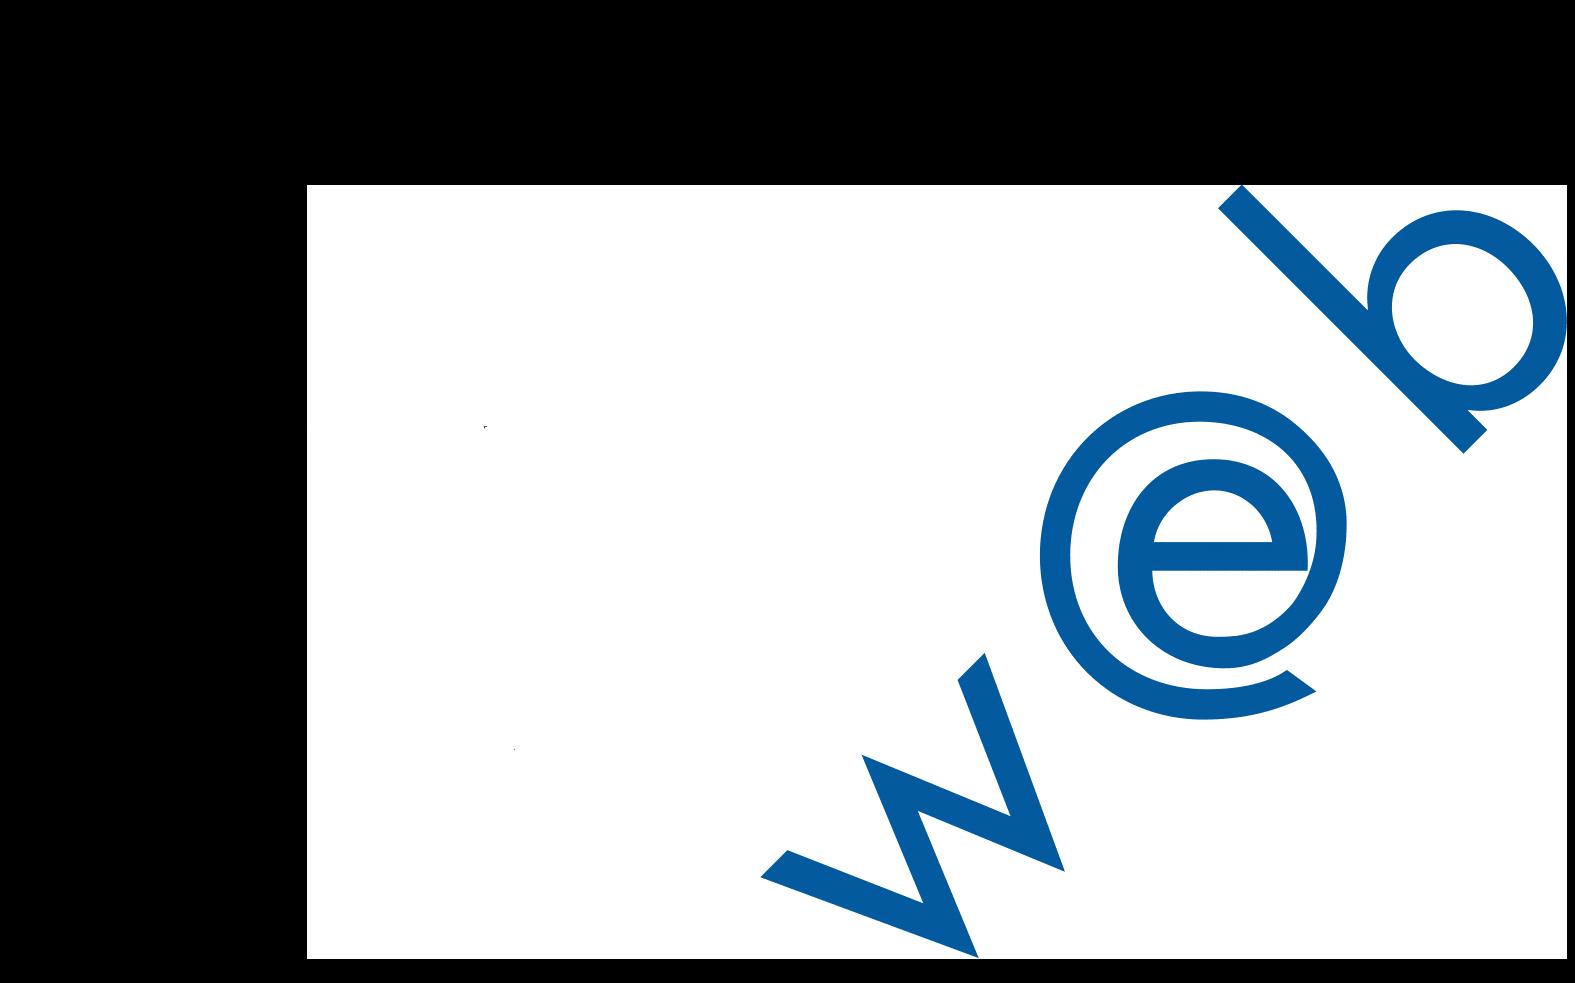 TyreWeb